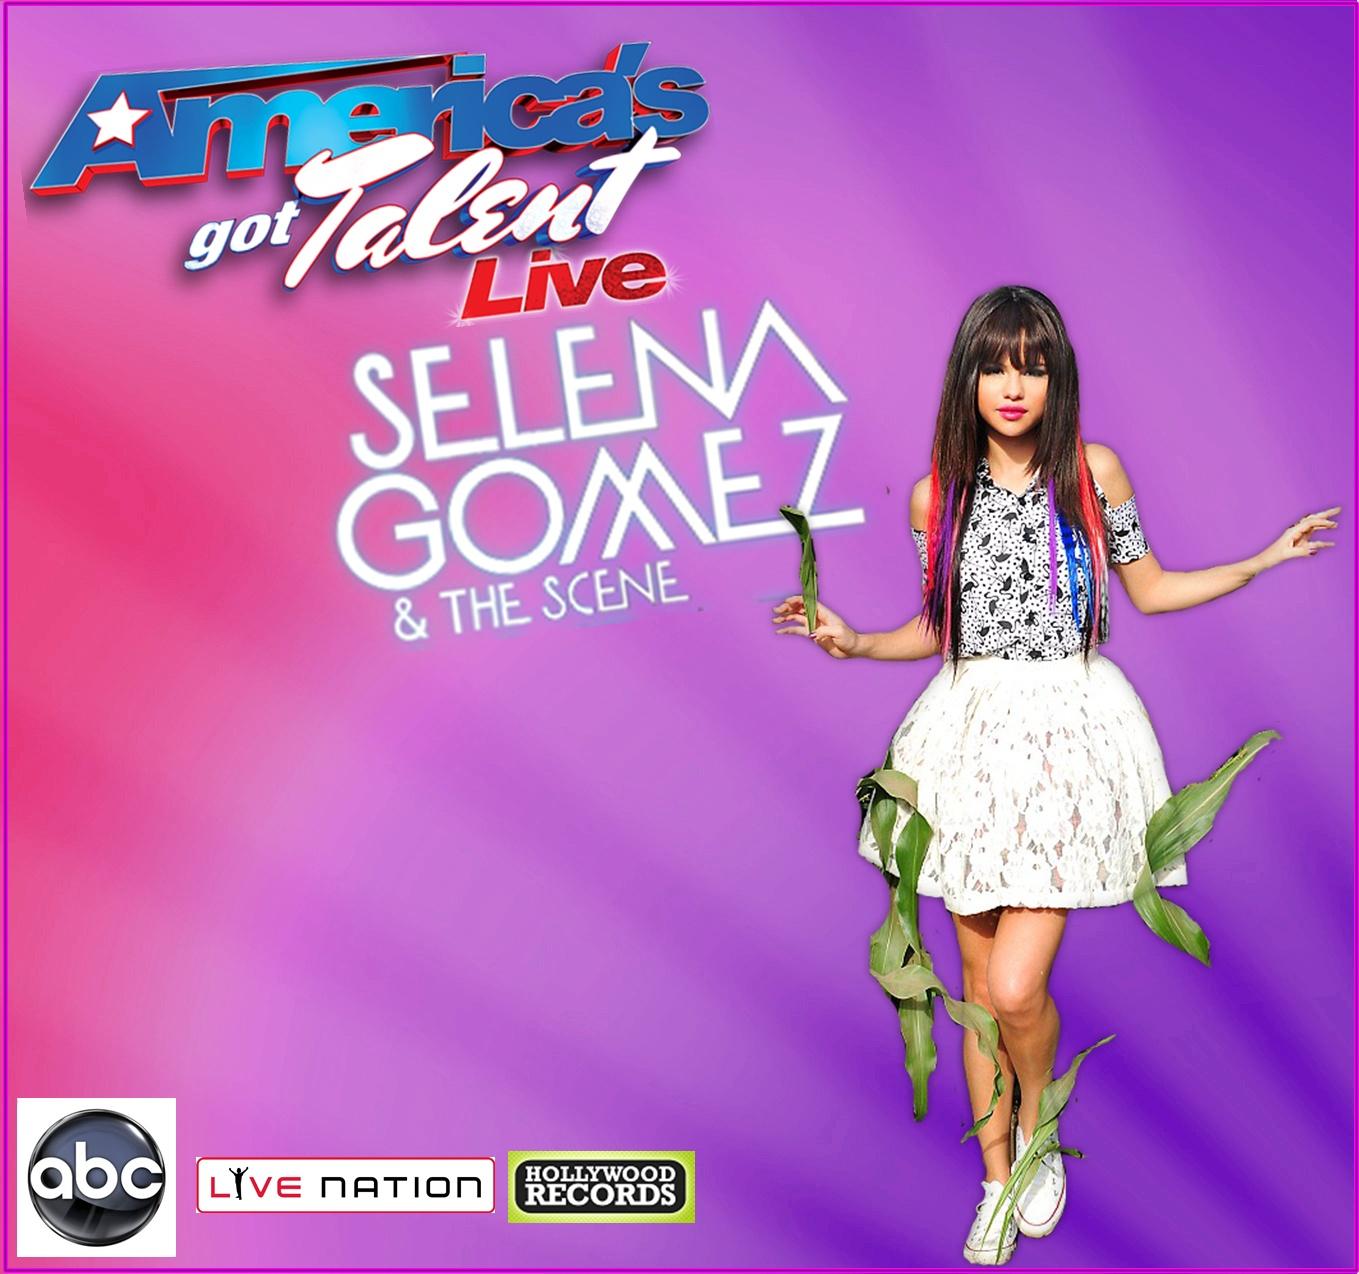 http://1.bp.blogspot.com/-x0eFAhEcZRc/T_8Tg3AJ6BI/AAAAAAAAAJI/PX0J047fgp4/s1600/americas_got_talente_live_selena_gomez.jpg